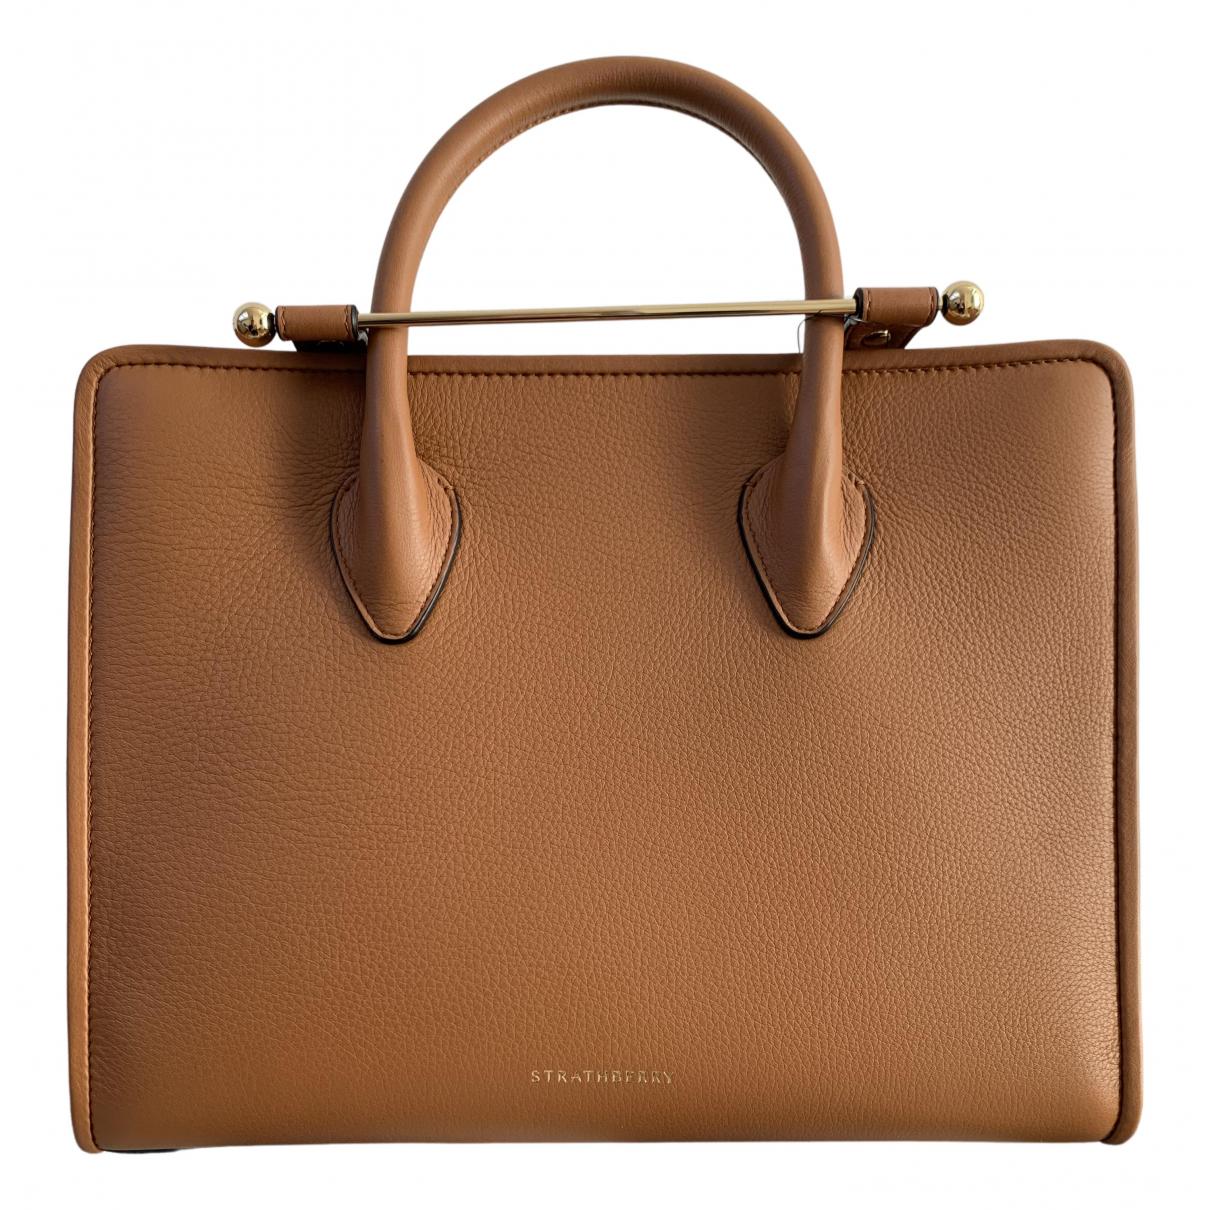 Strathberry N Camel Leather handbag for Women N